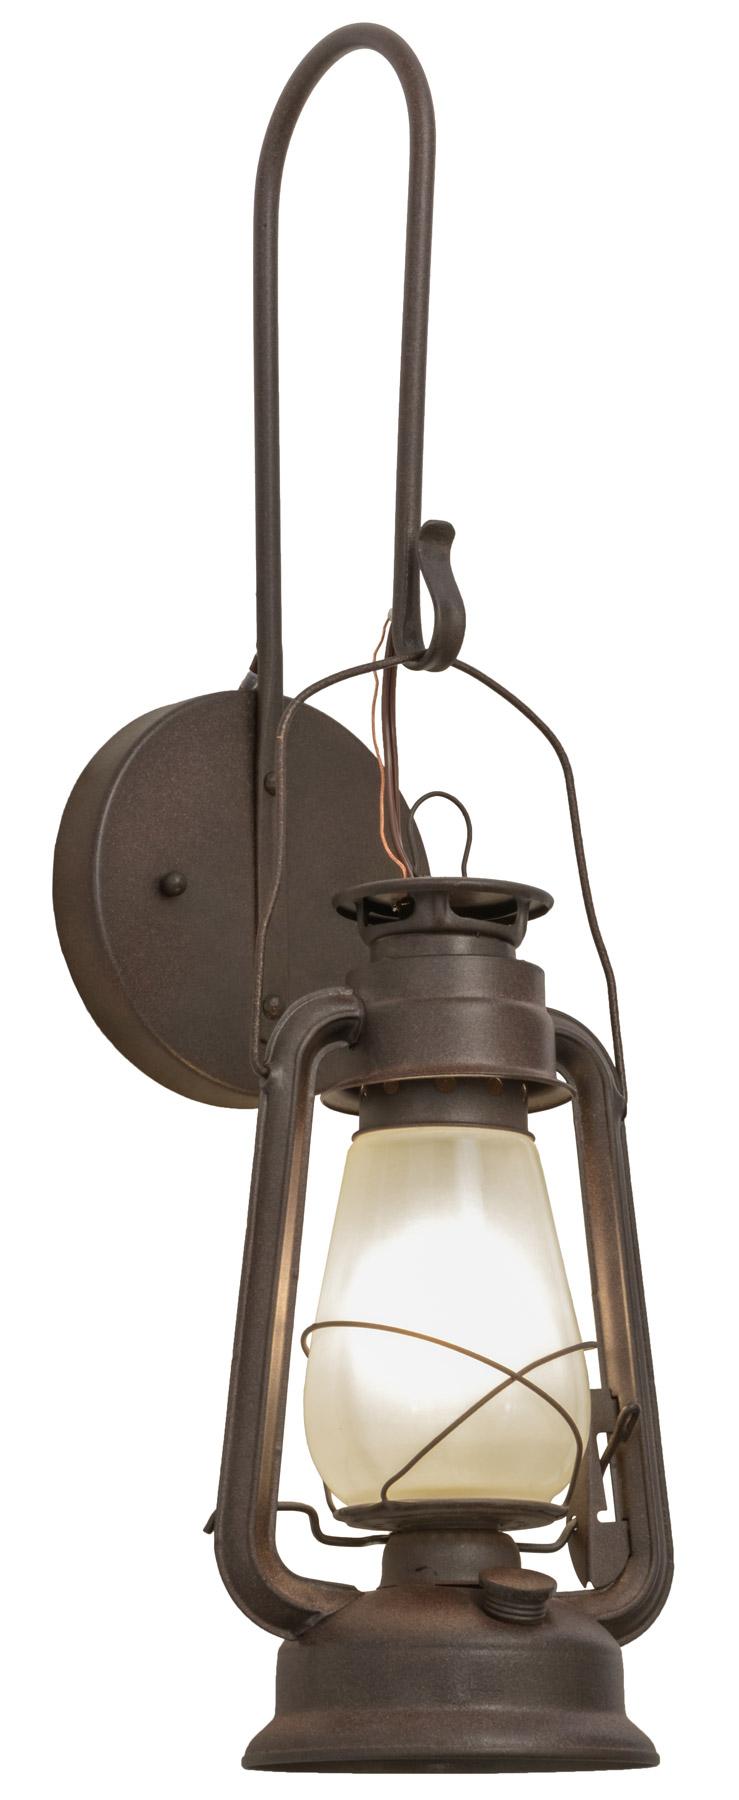 Meyda 153107 Miners Lantern Wall Sconce